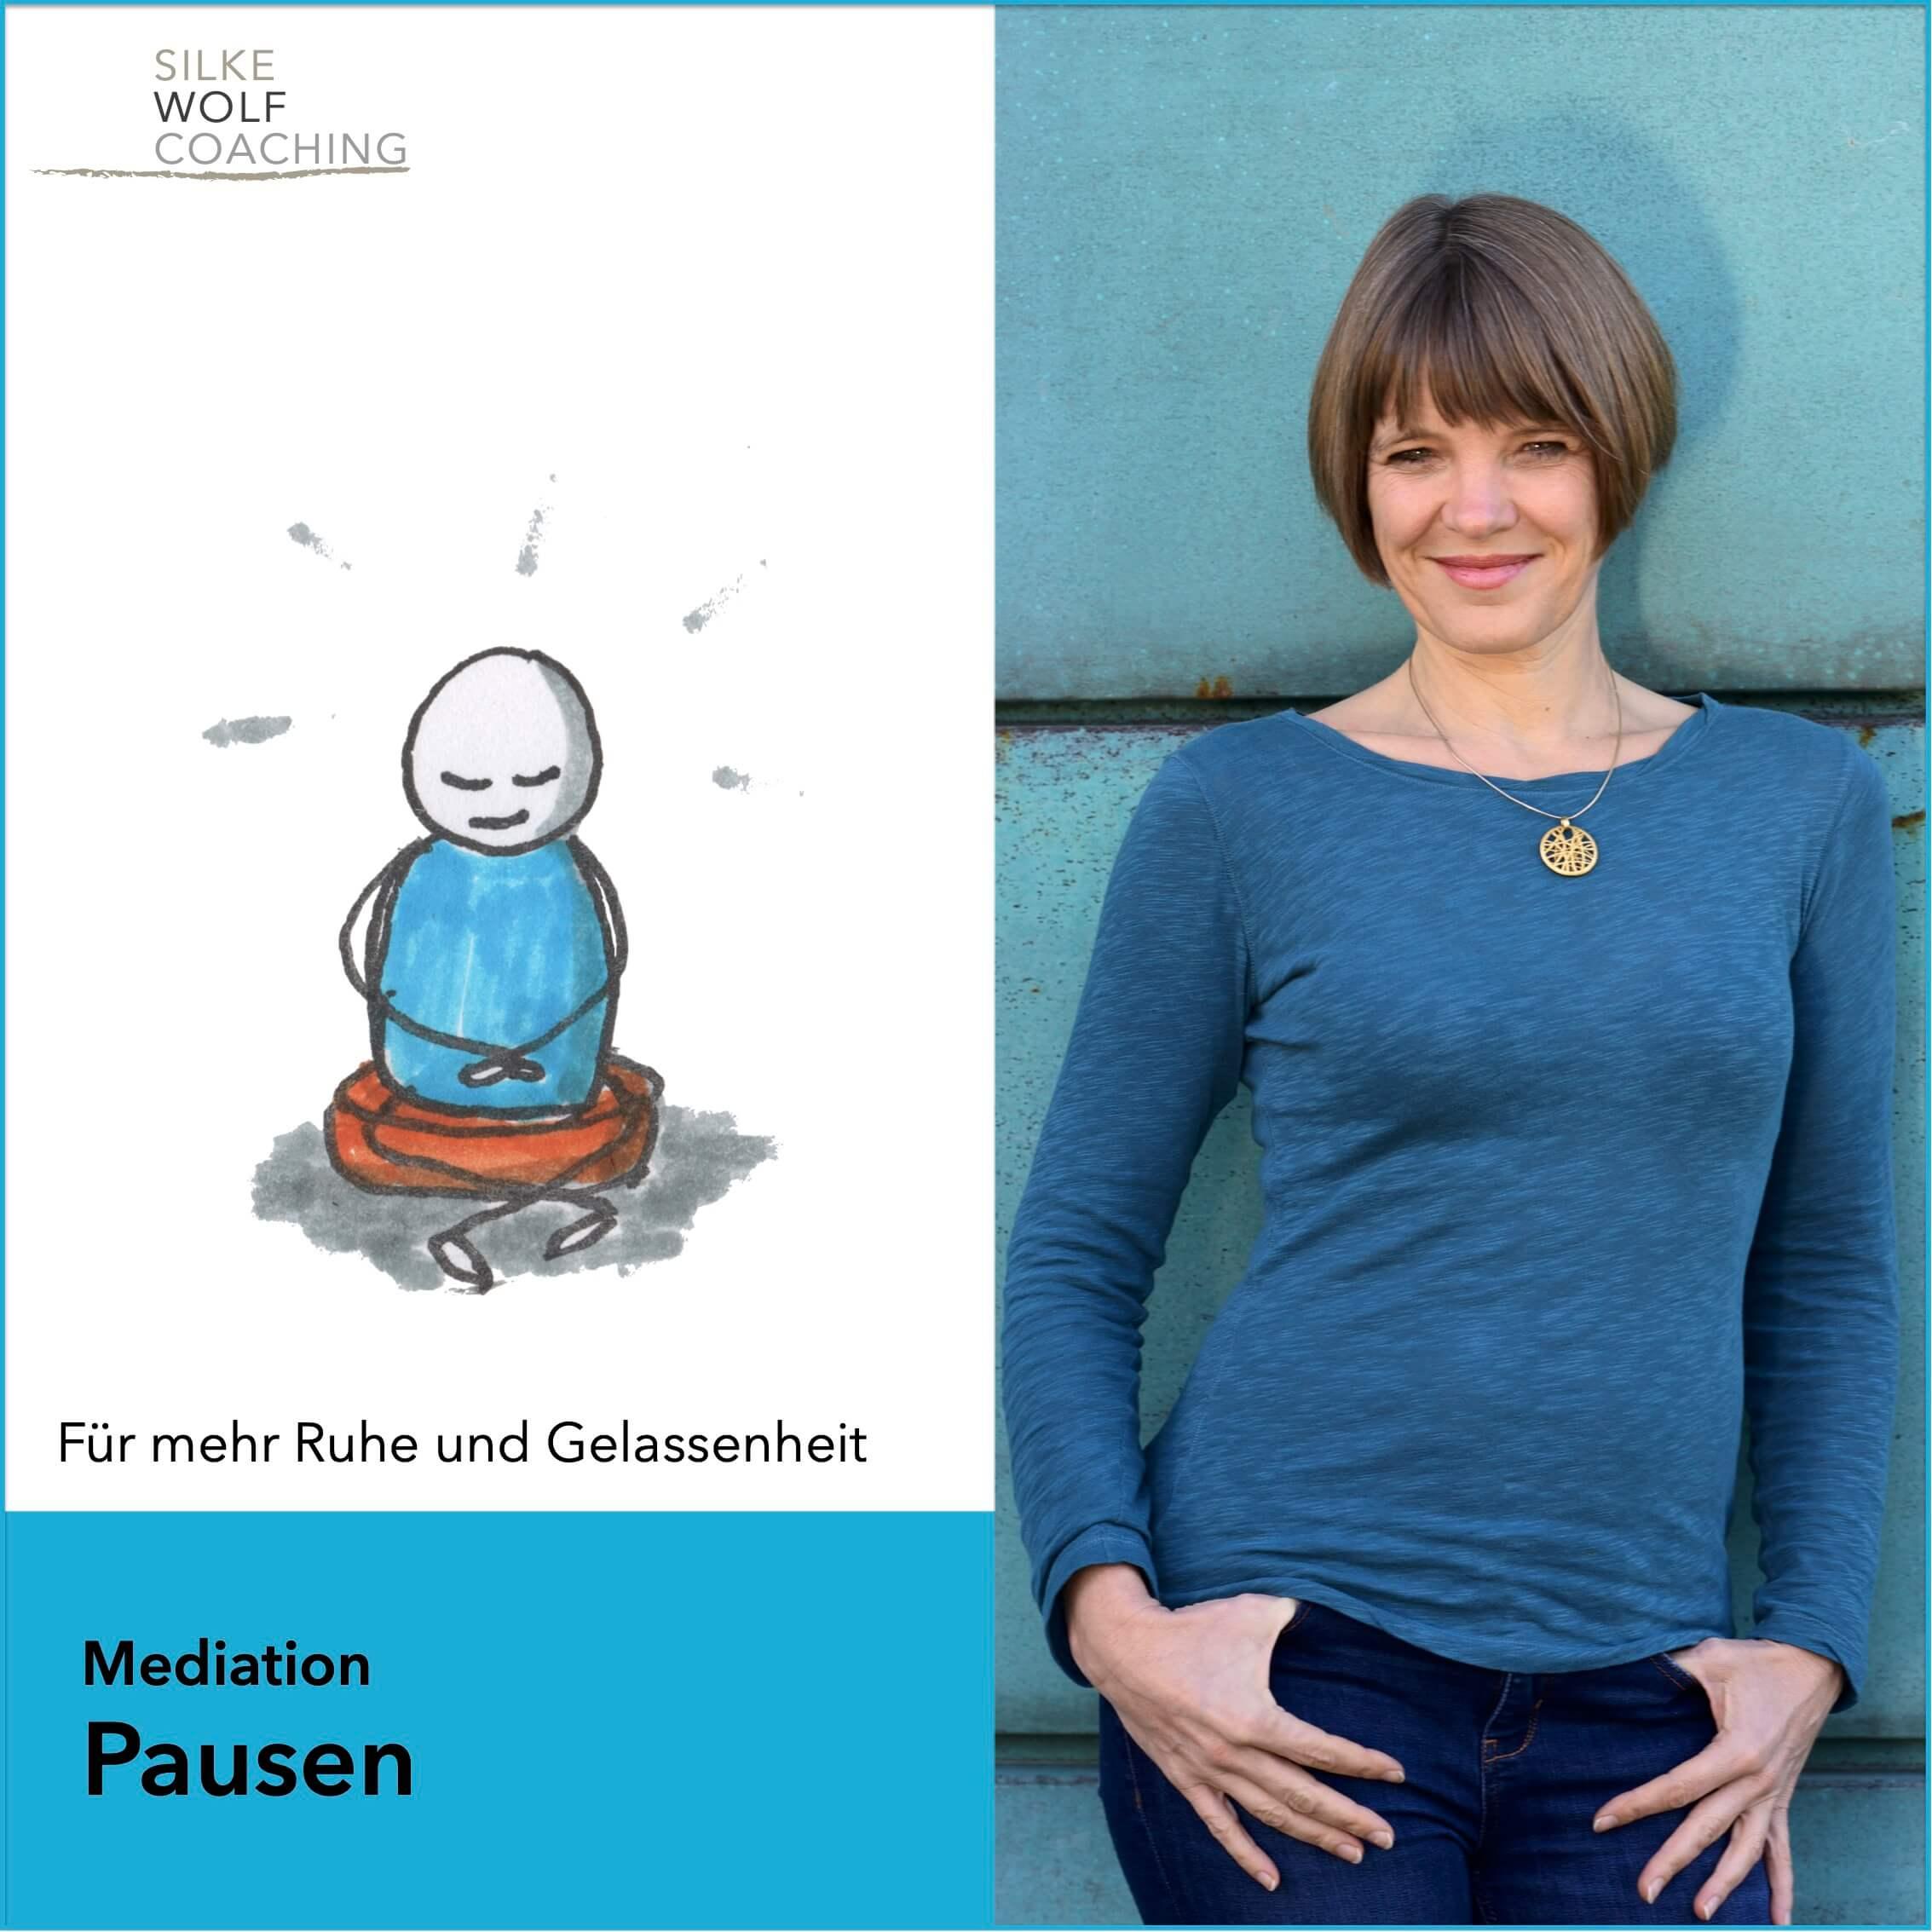 Meditation-Pause-Thumbnail Silke Wolf